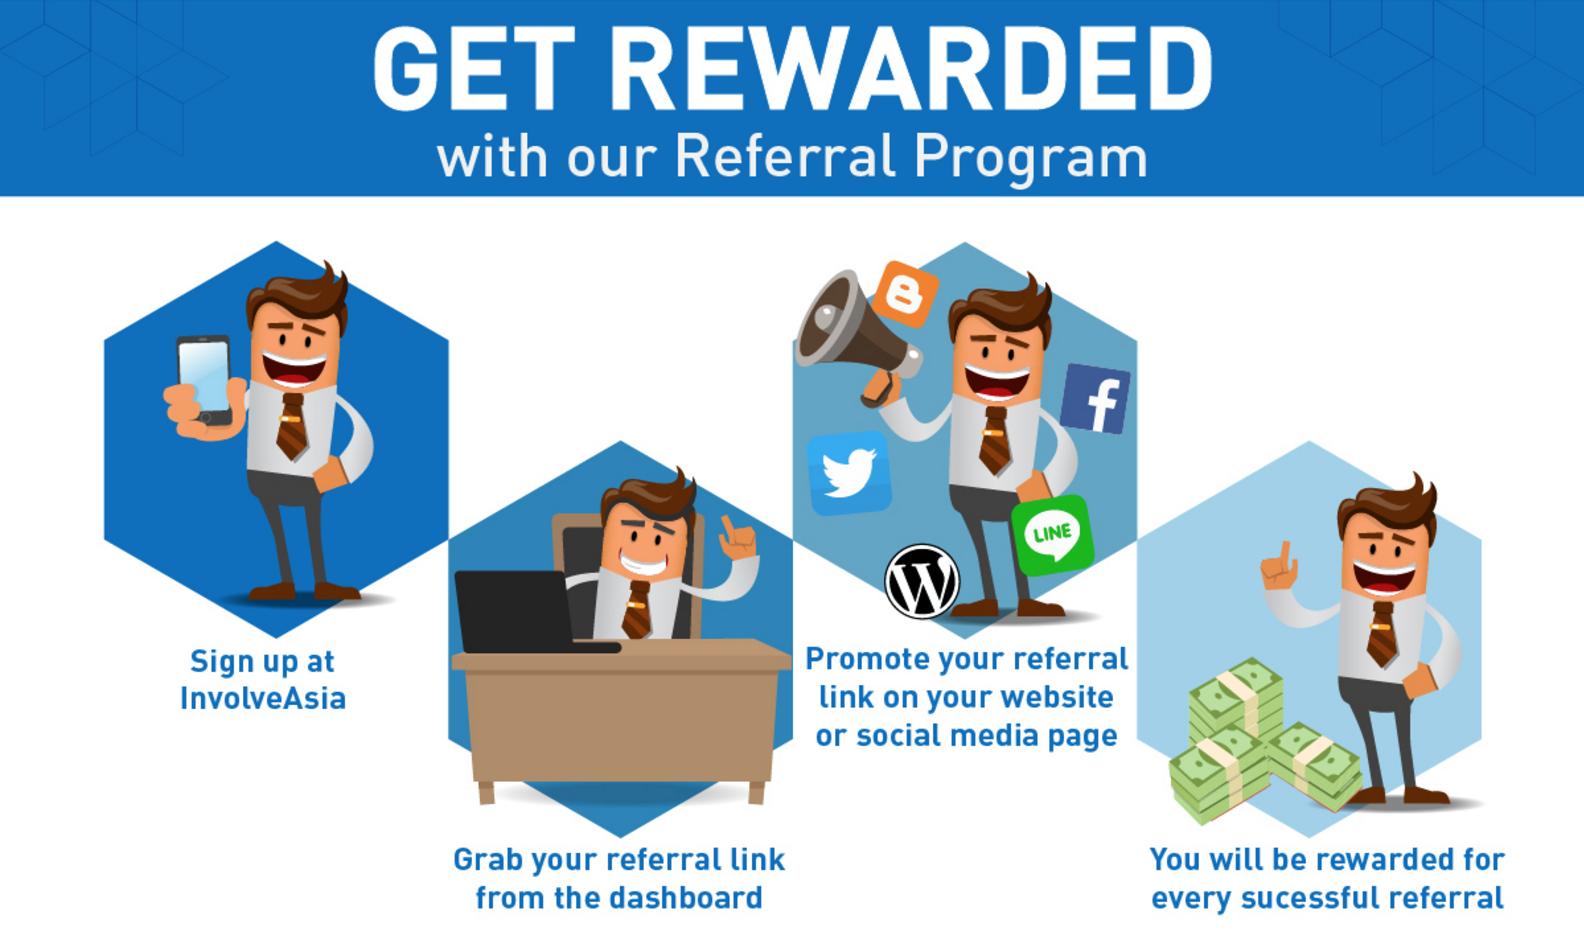 InvolveAsia Referral Program